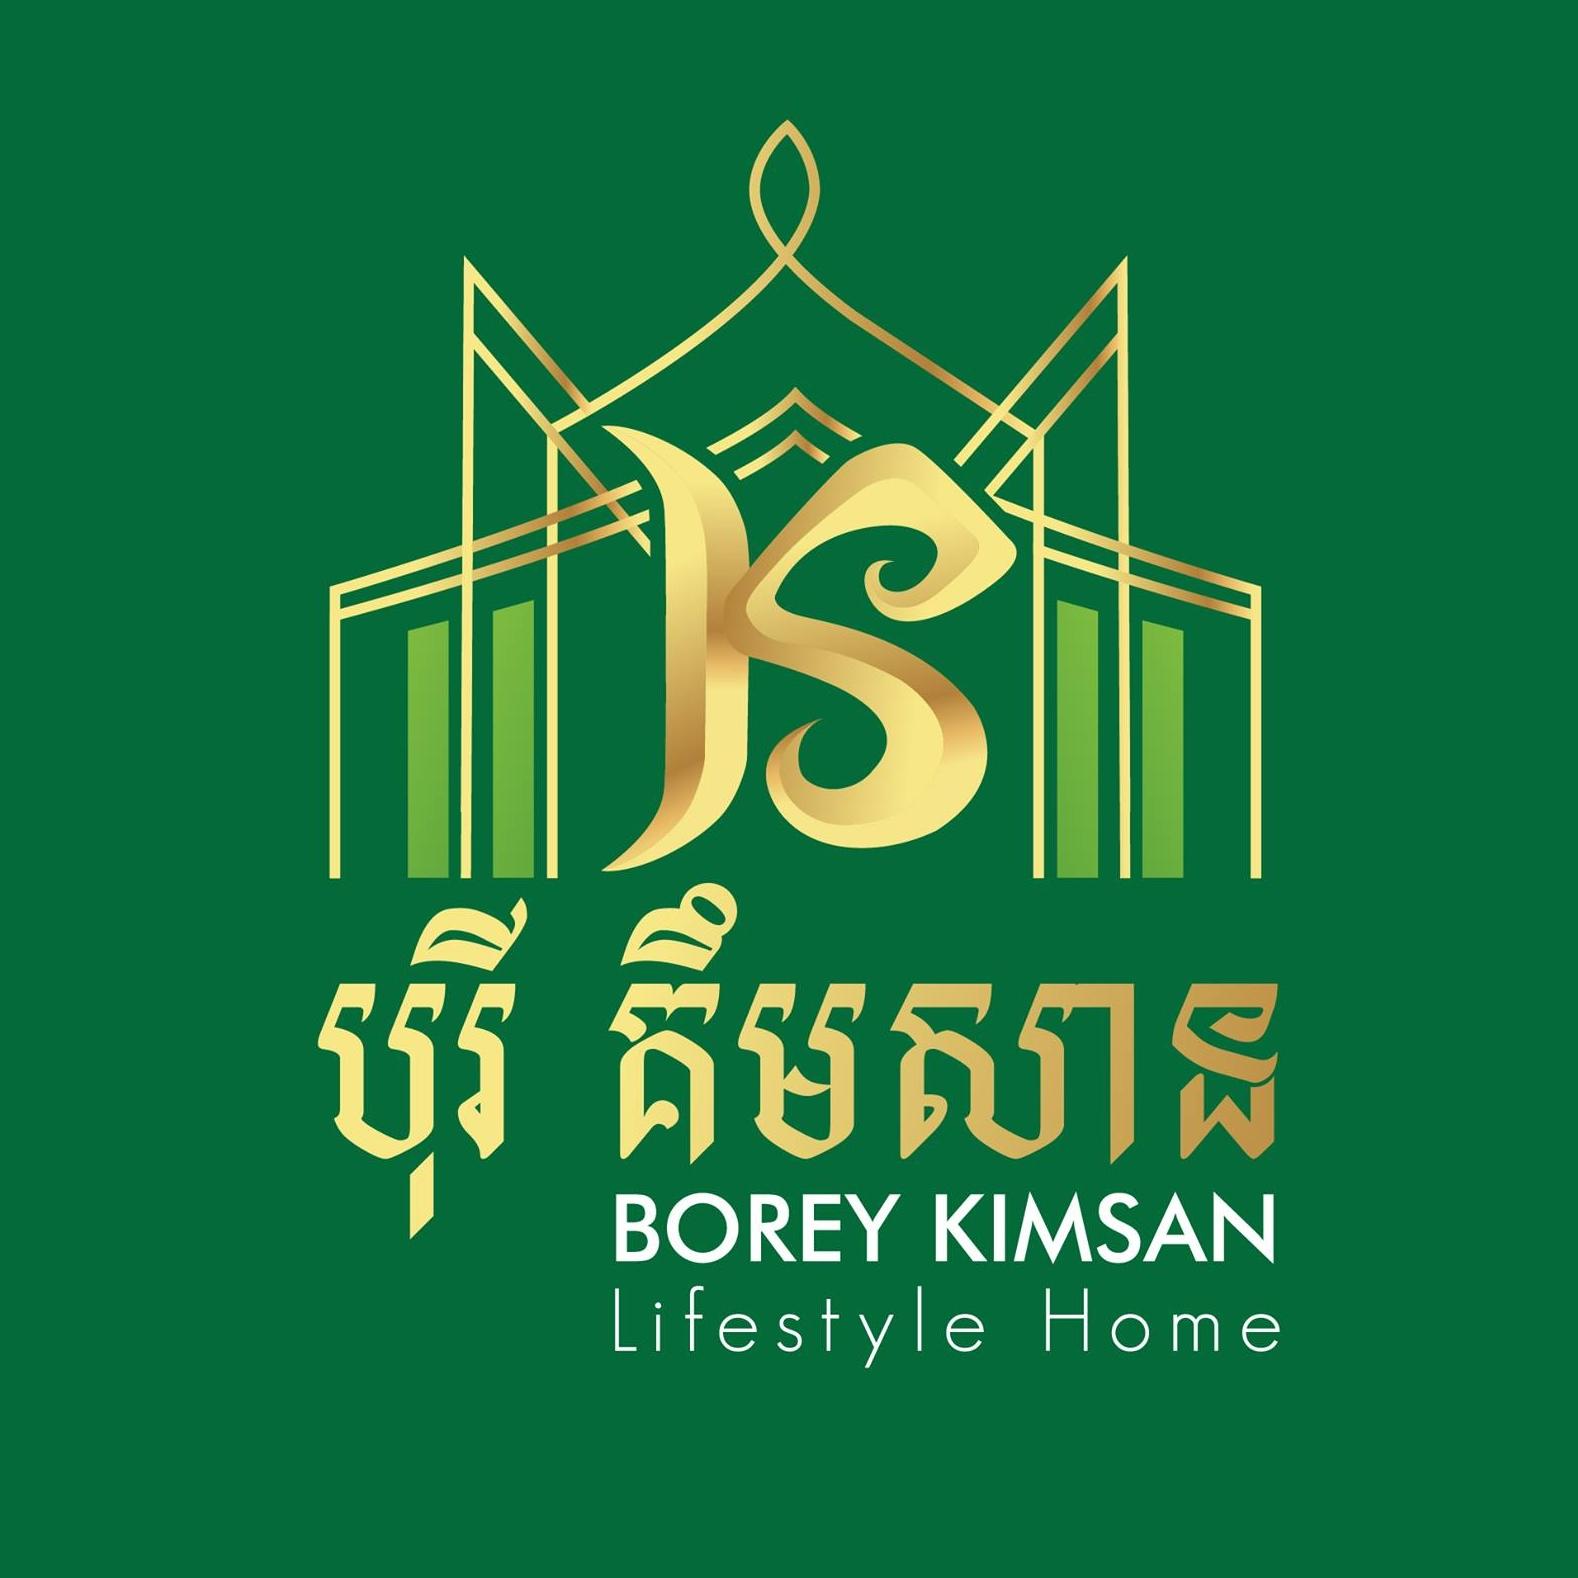 Borey Kimsan